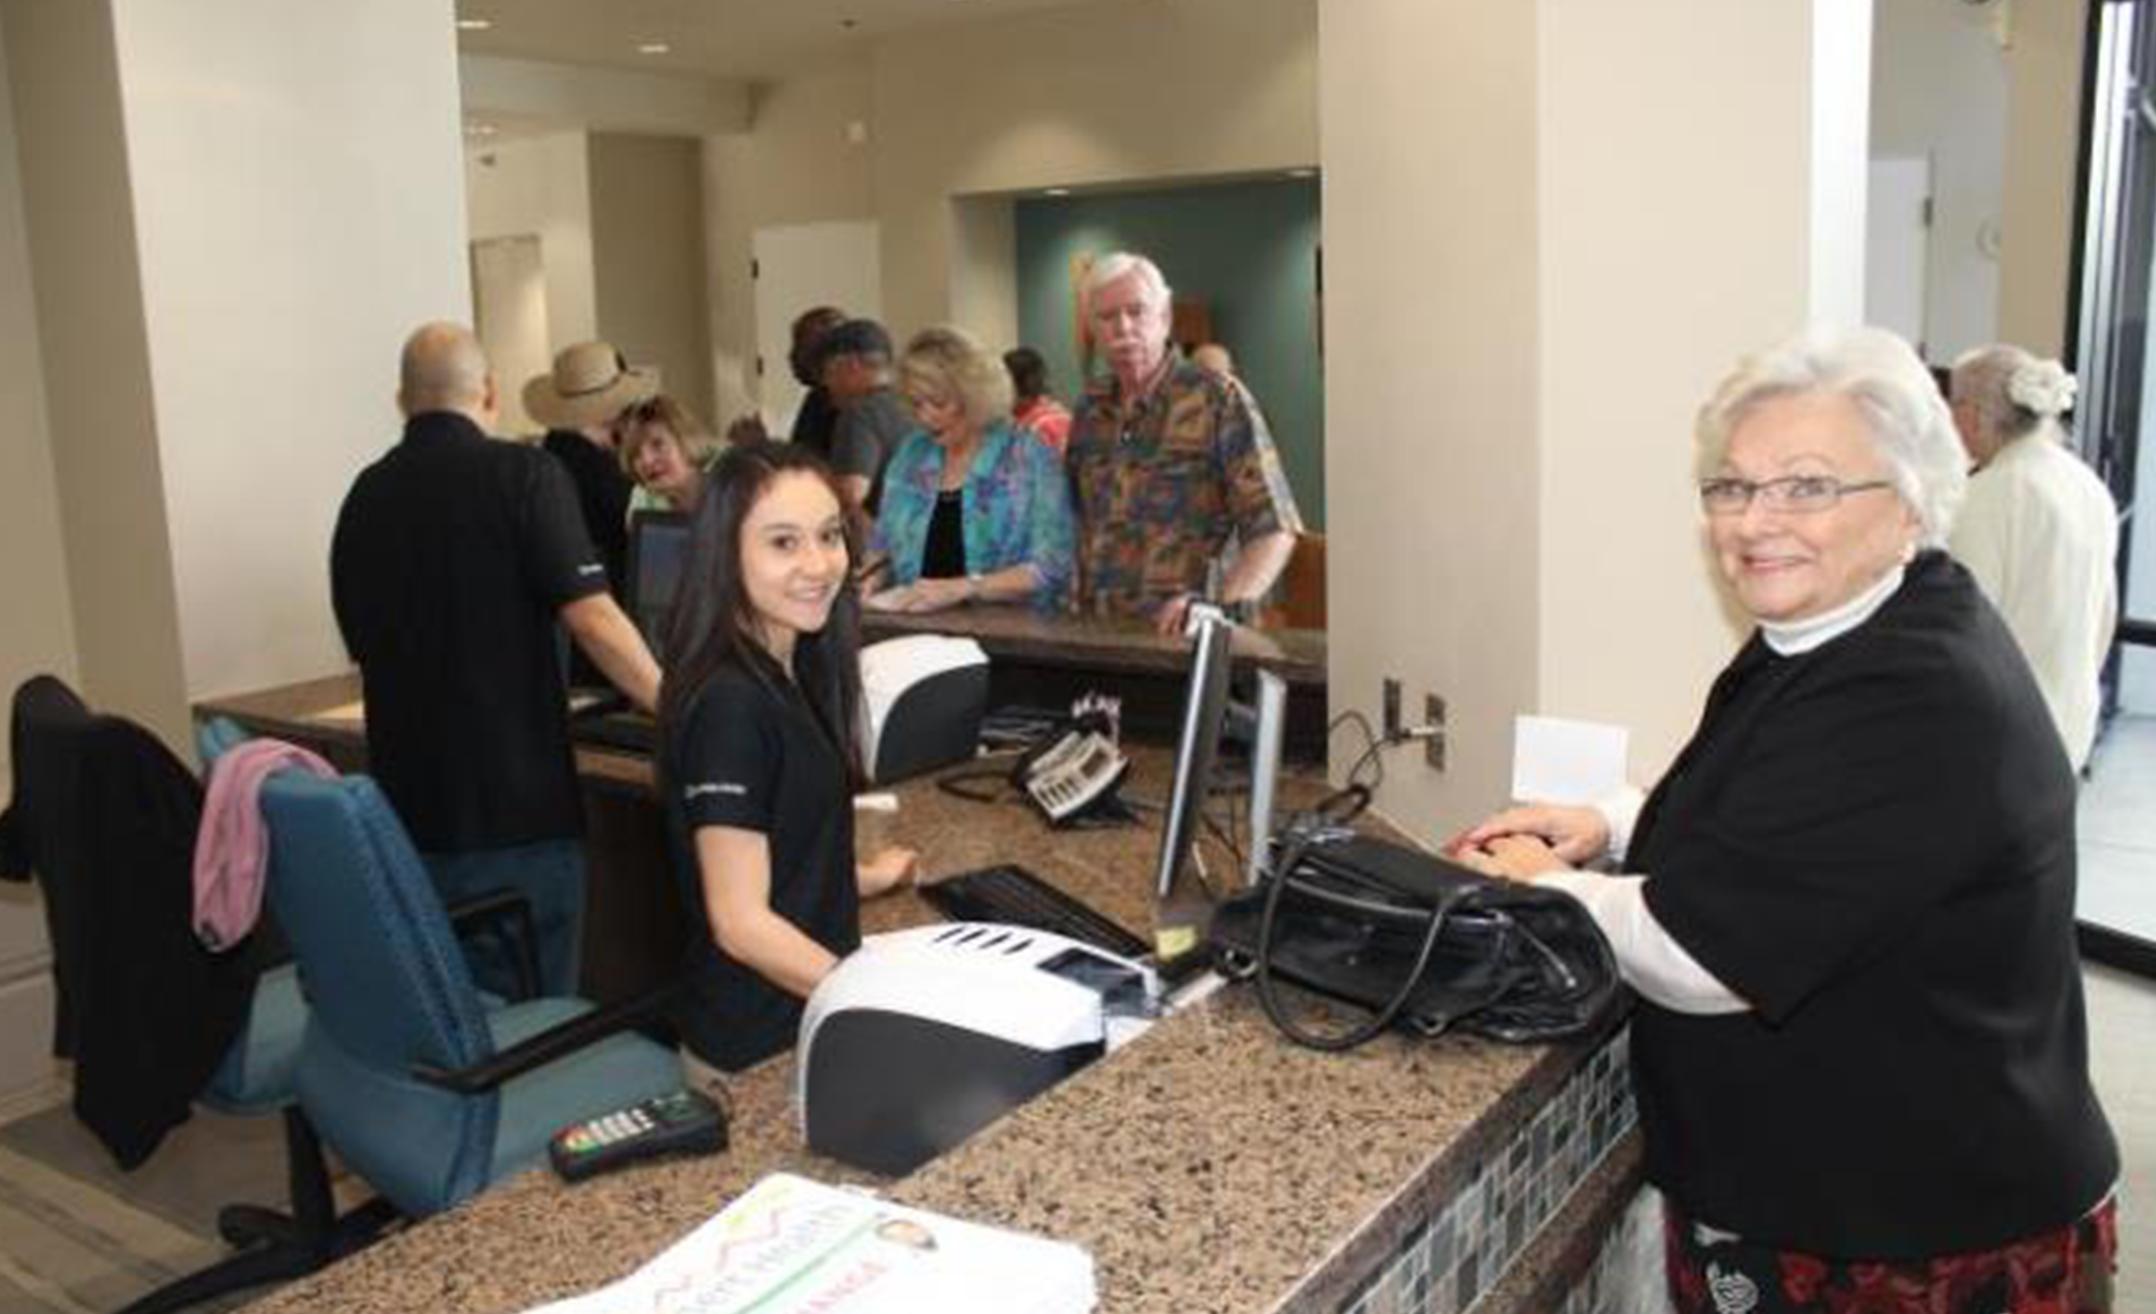 Friendly service at the La Quinta Senior & Wellness Center